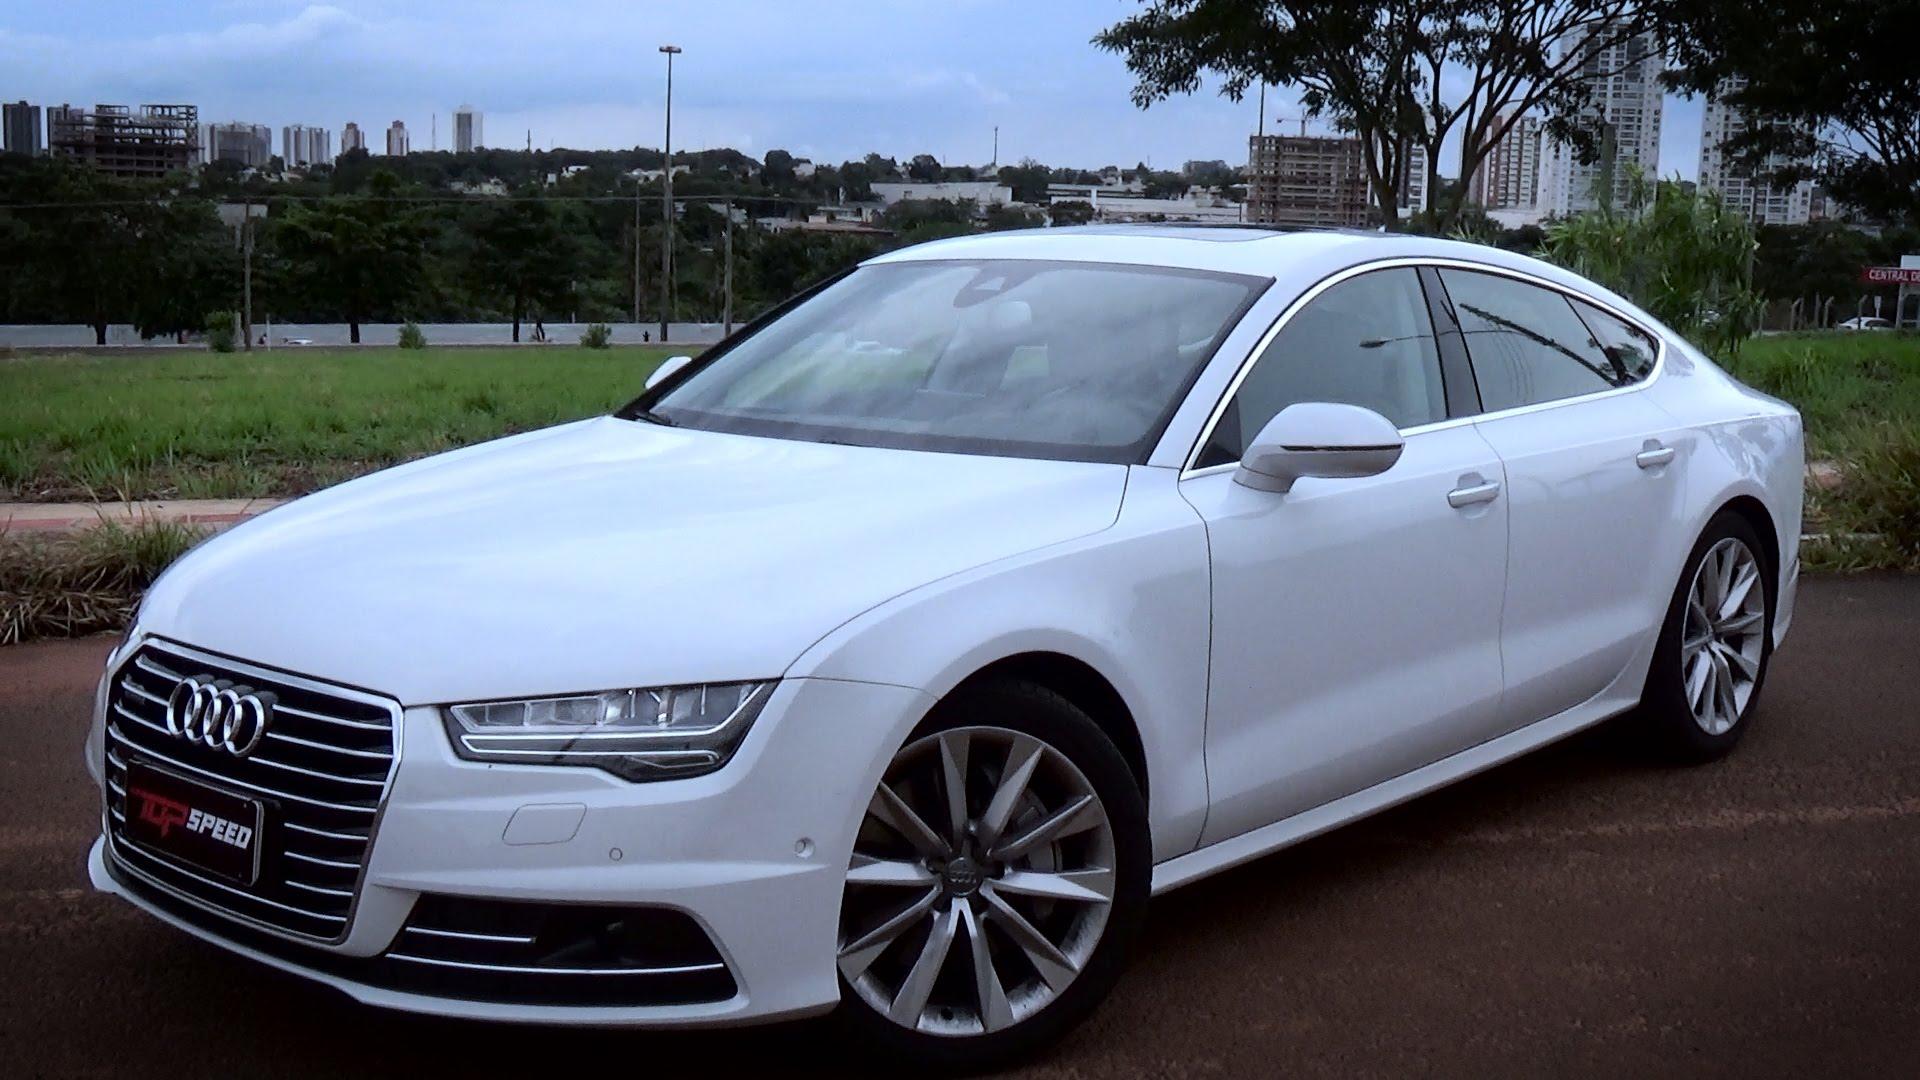 Audi-A7-1